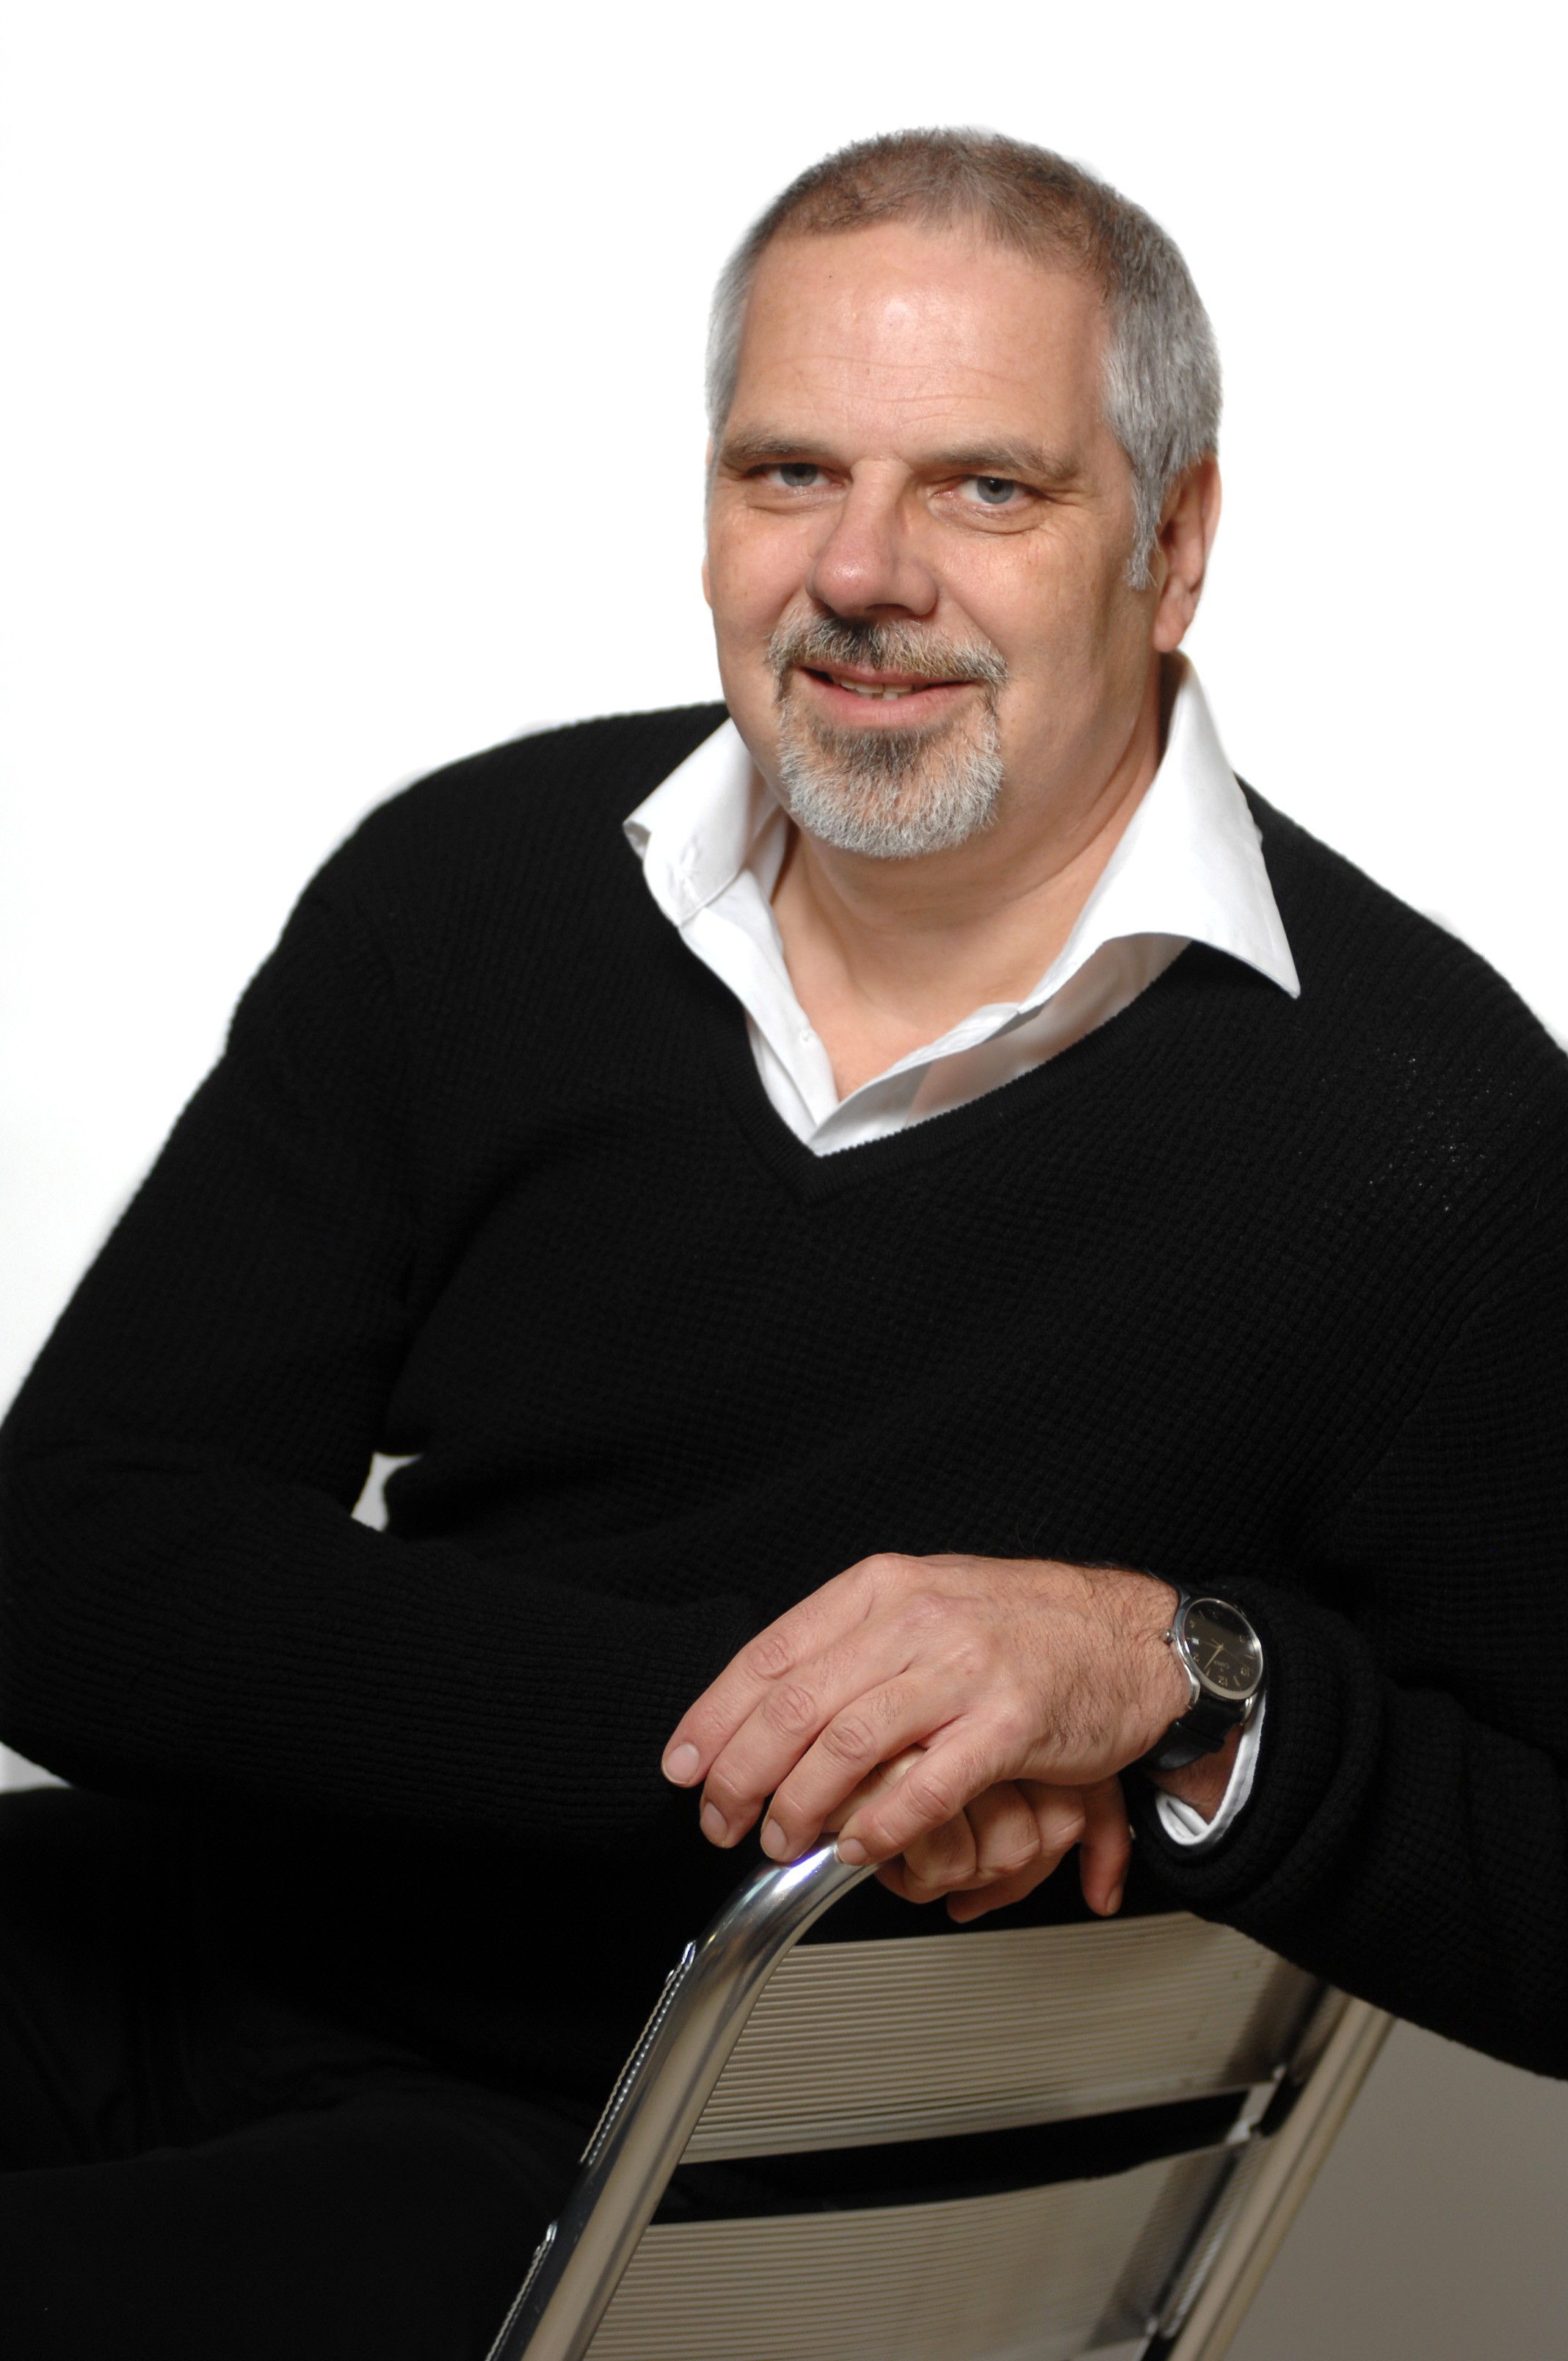 Prof. Dr. Dieter Wolke Professor Psychologie Forschungsleiter Warwick University Studie